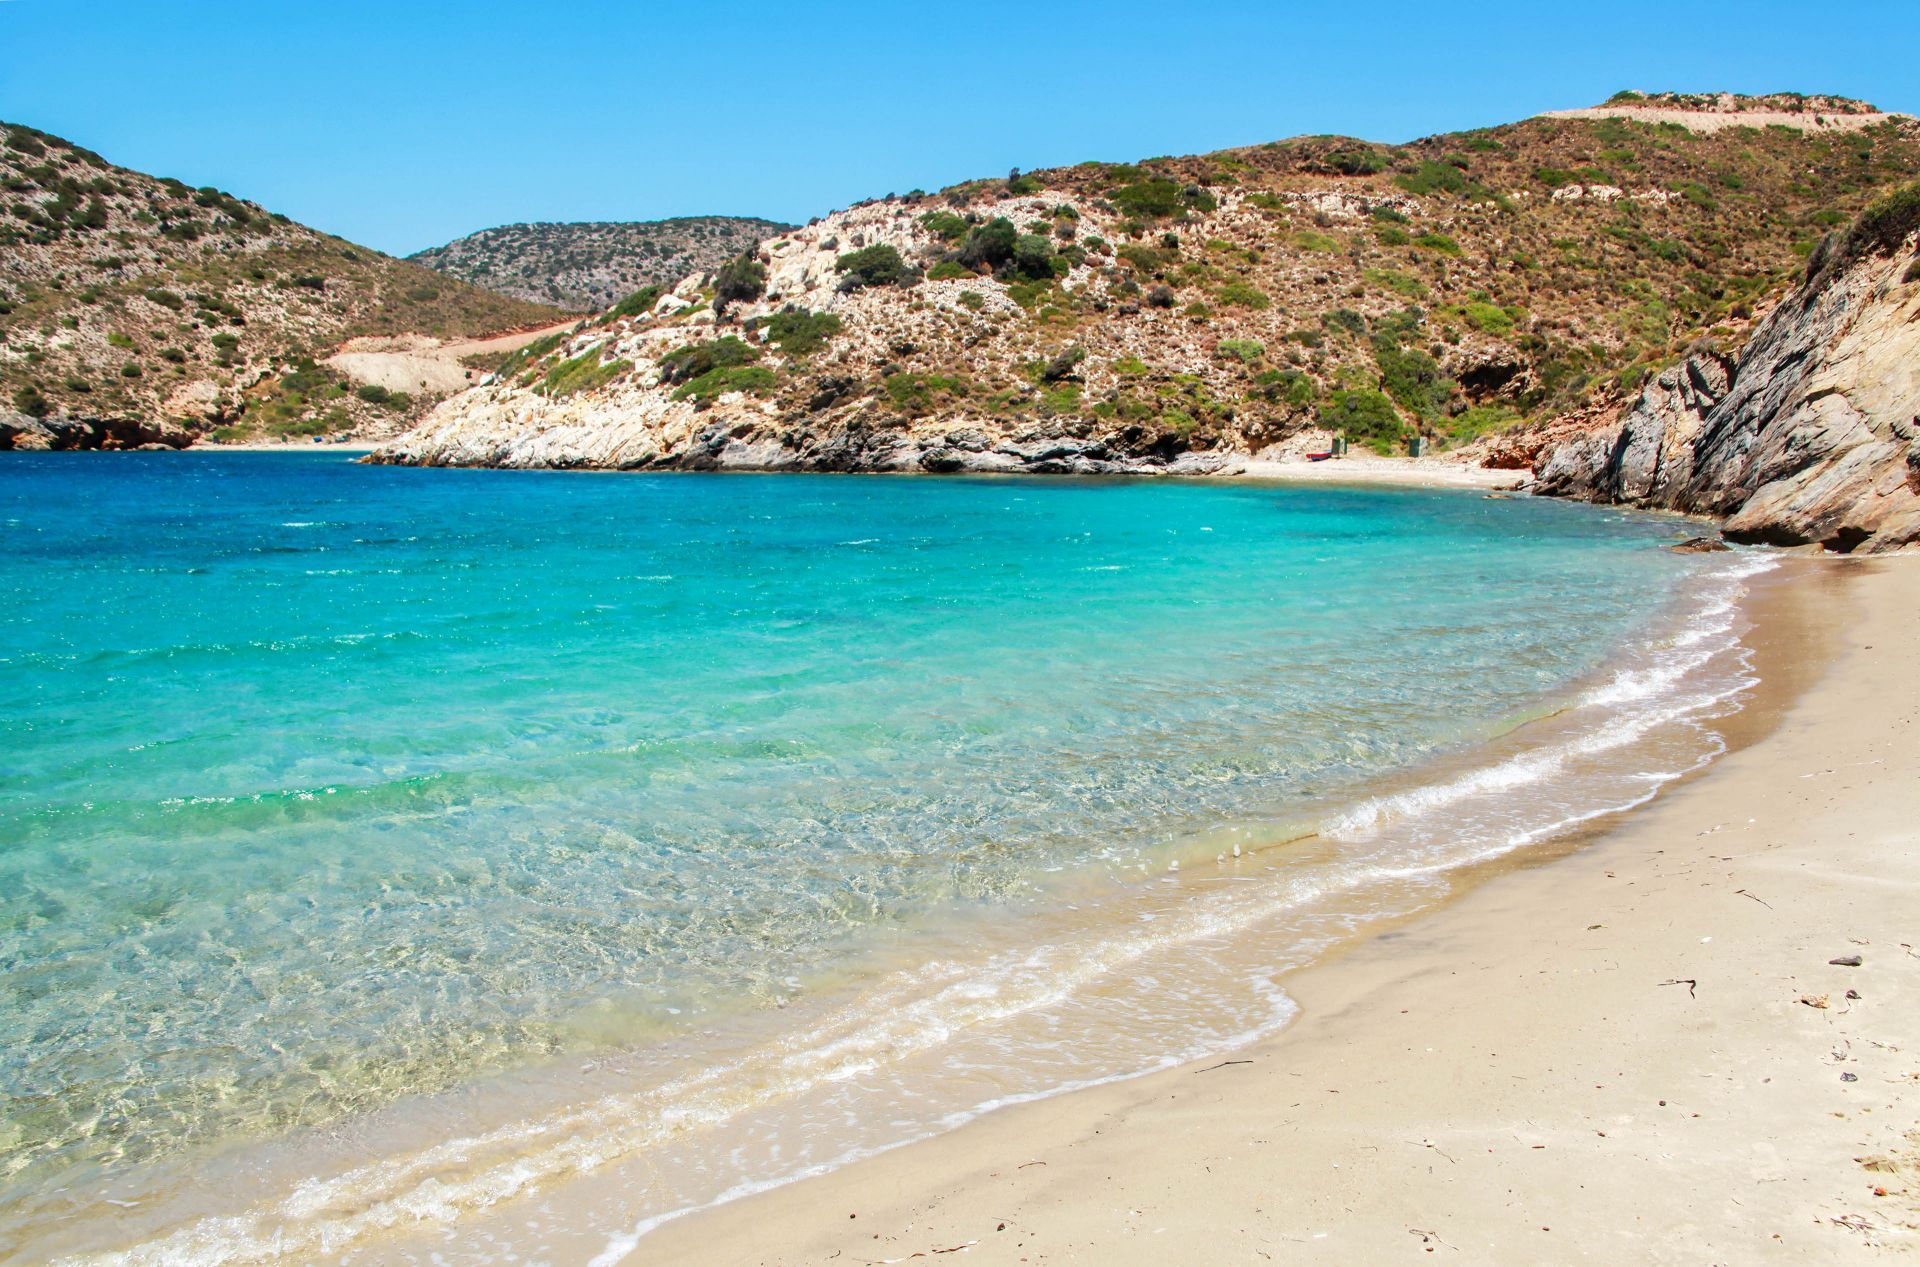 Fourni island: Kassidi beach